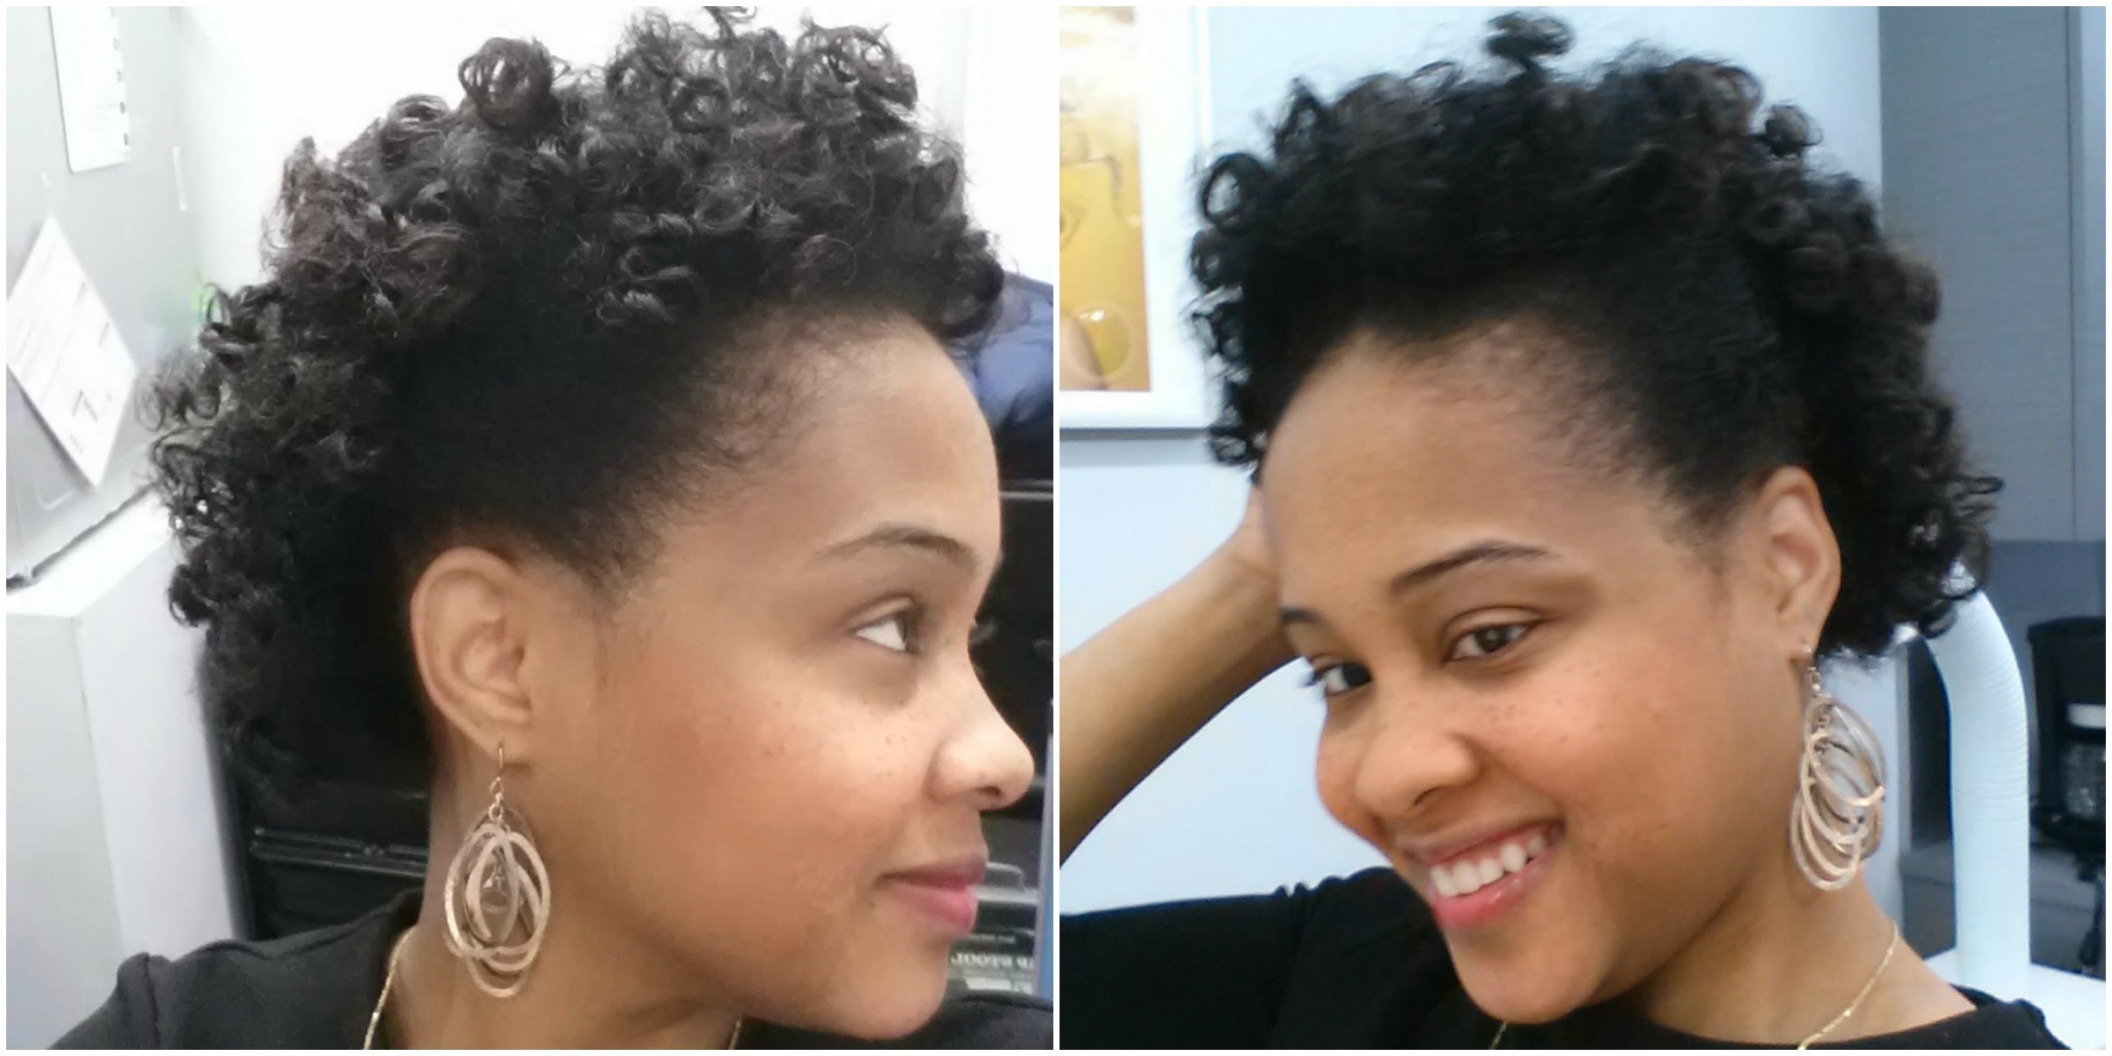 Bantu Knots Hair Tutorial On Transitioning Hair ? Short Natural Within Short Haircuts For Transitioning Hair (View 4 of 25)